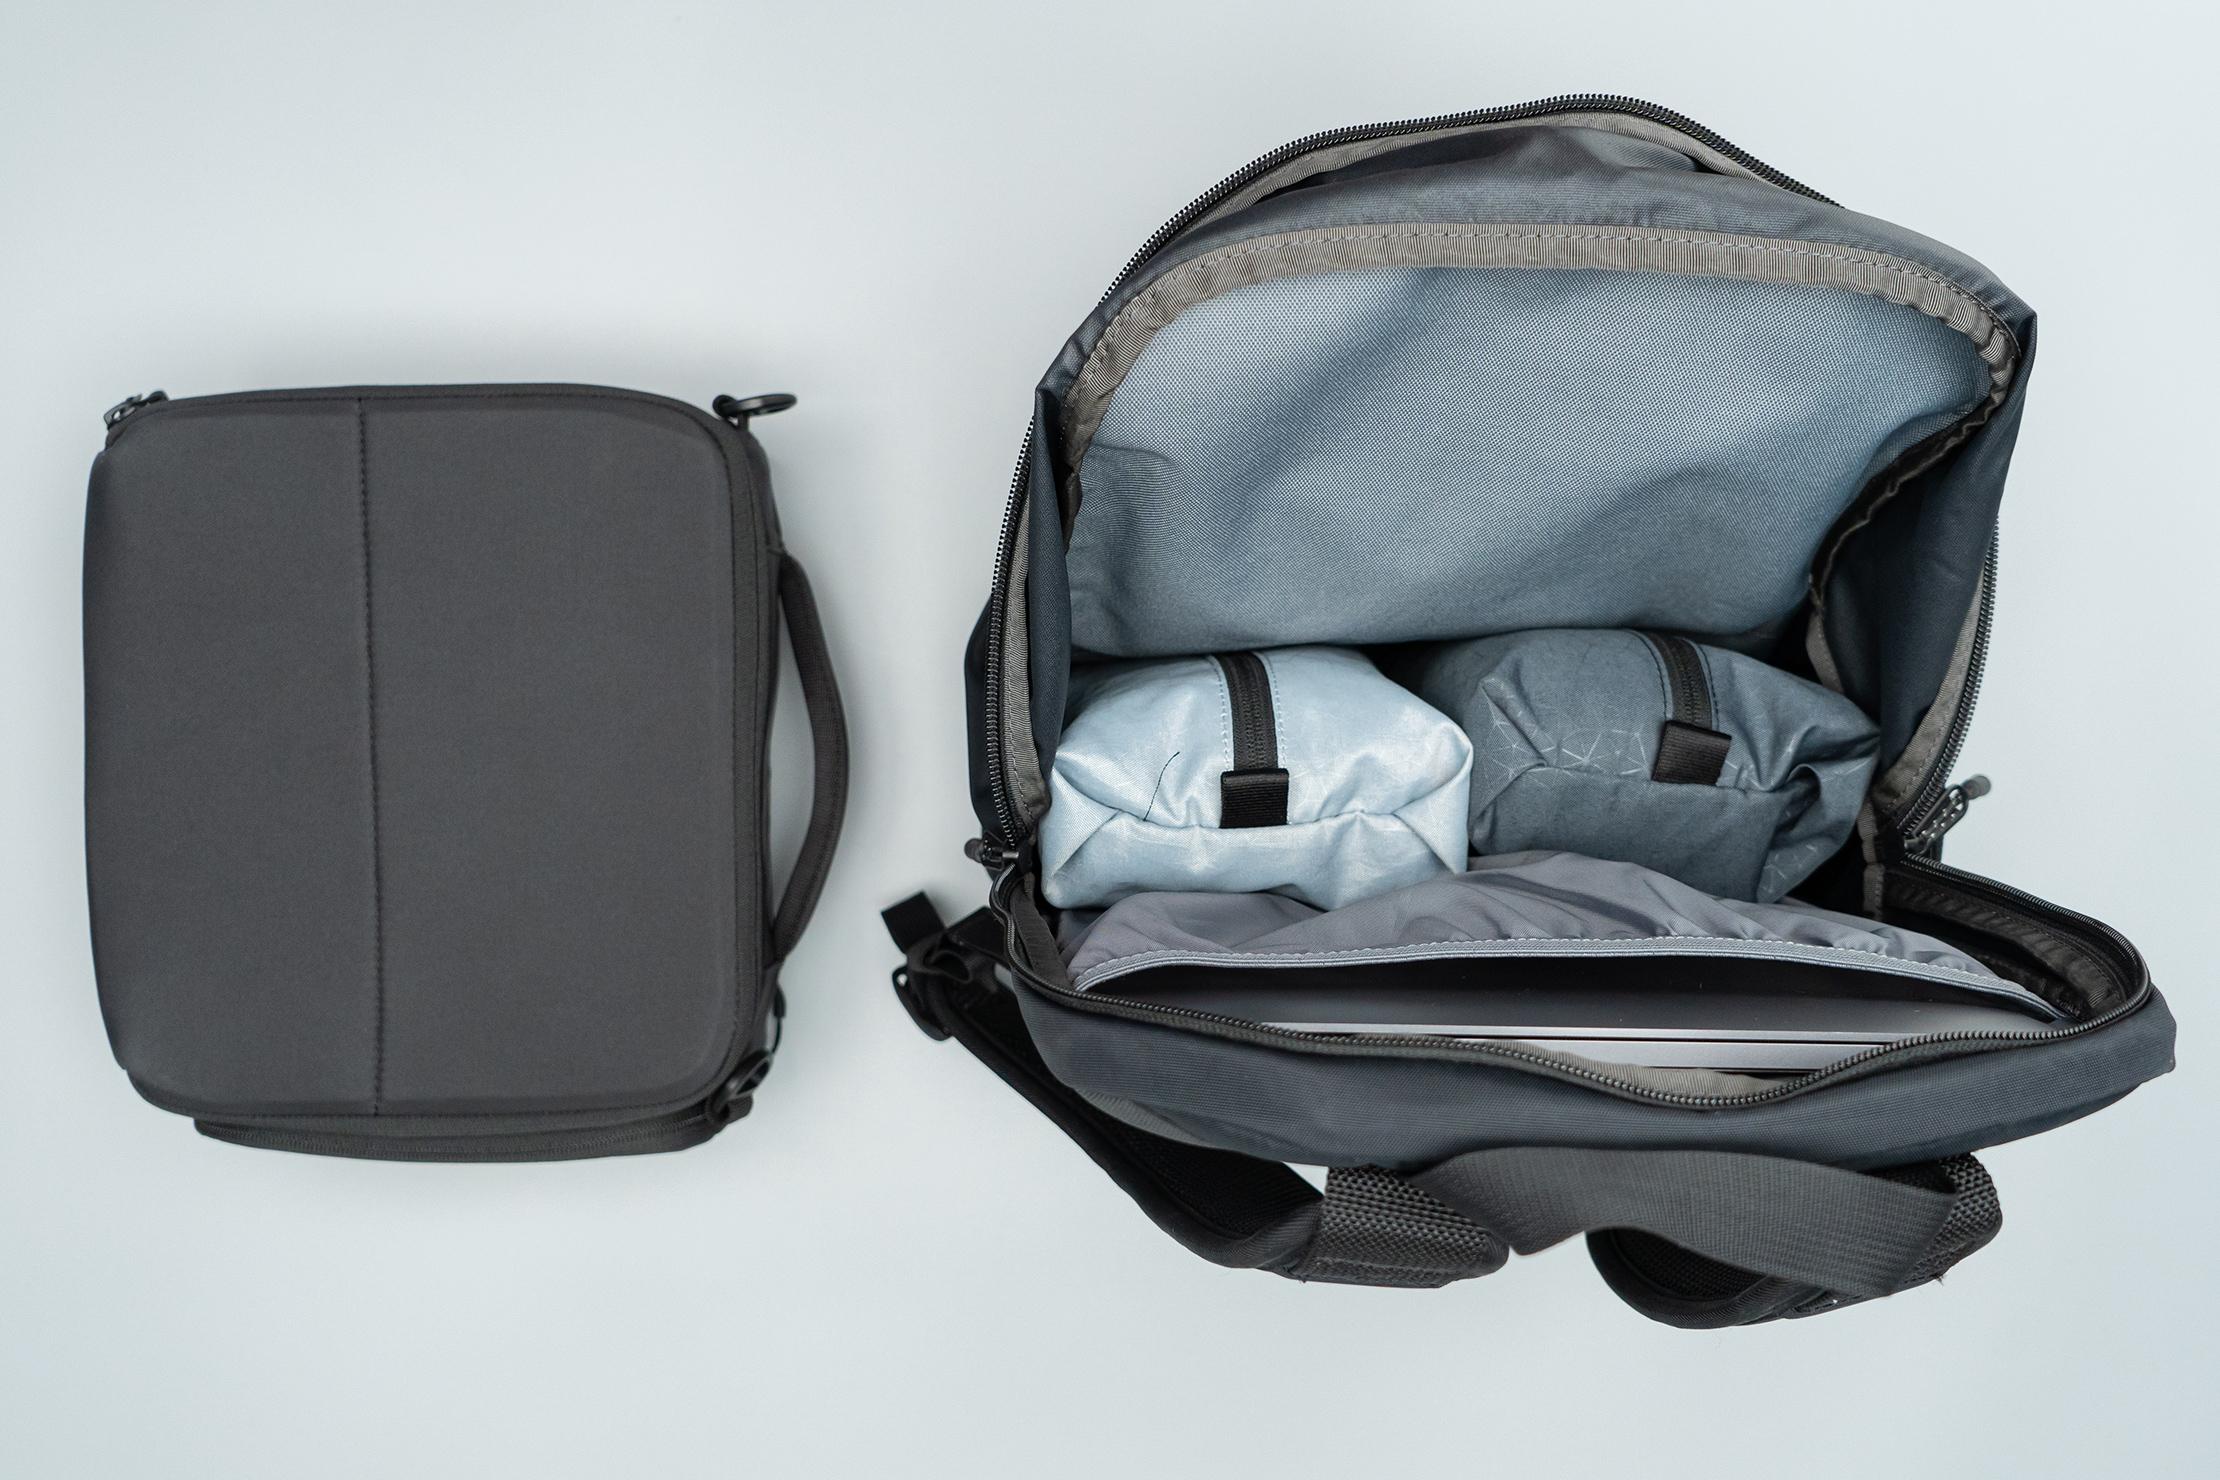 Timbuk2 Parkside Laptop Backpack 2.0 Camera Cube